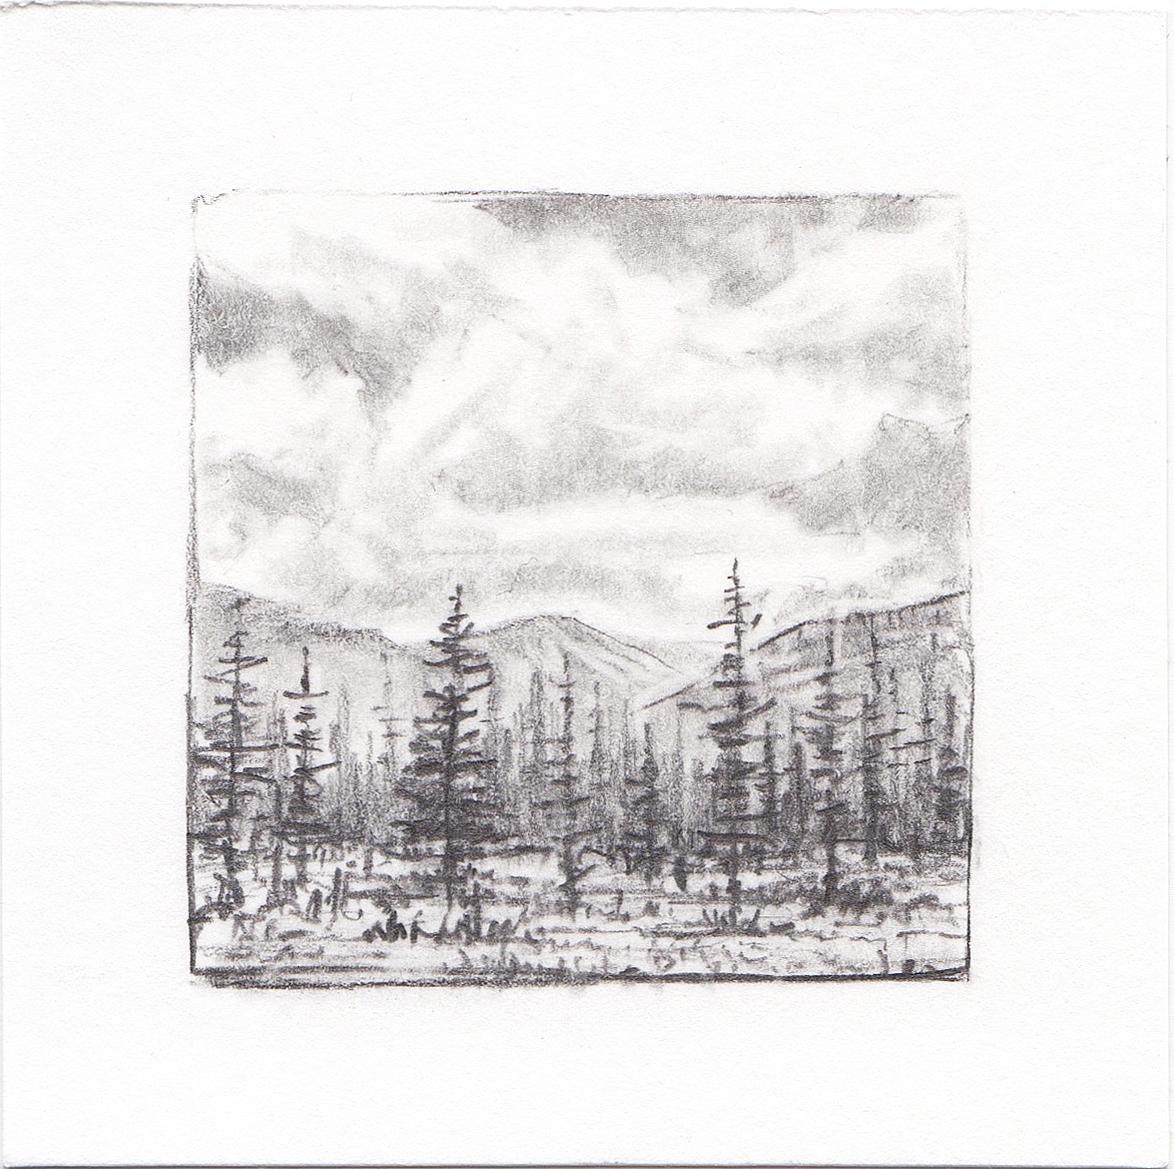 #16 Yosemite National Park, California | 3x3 | graphite